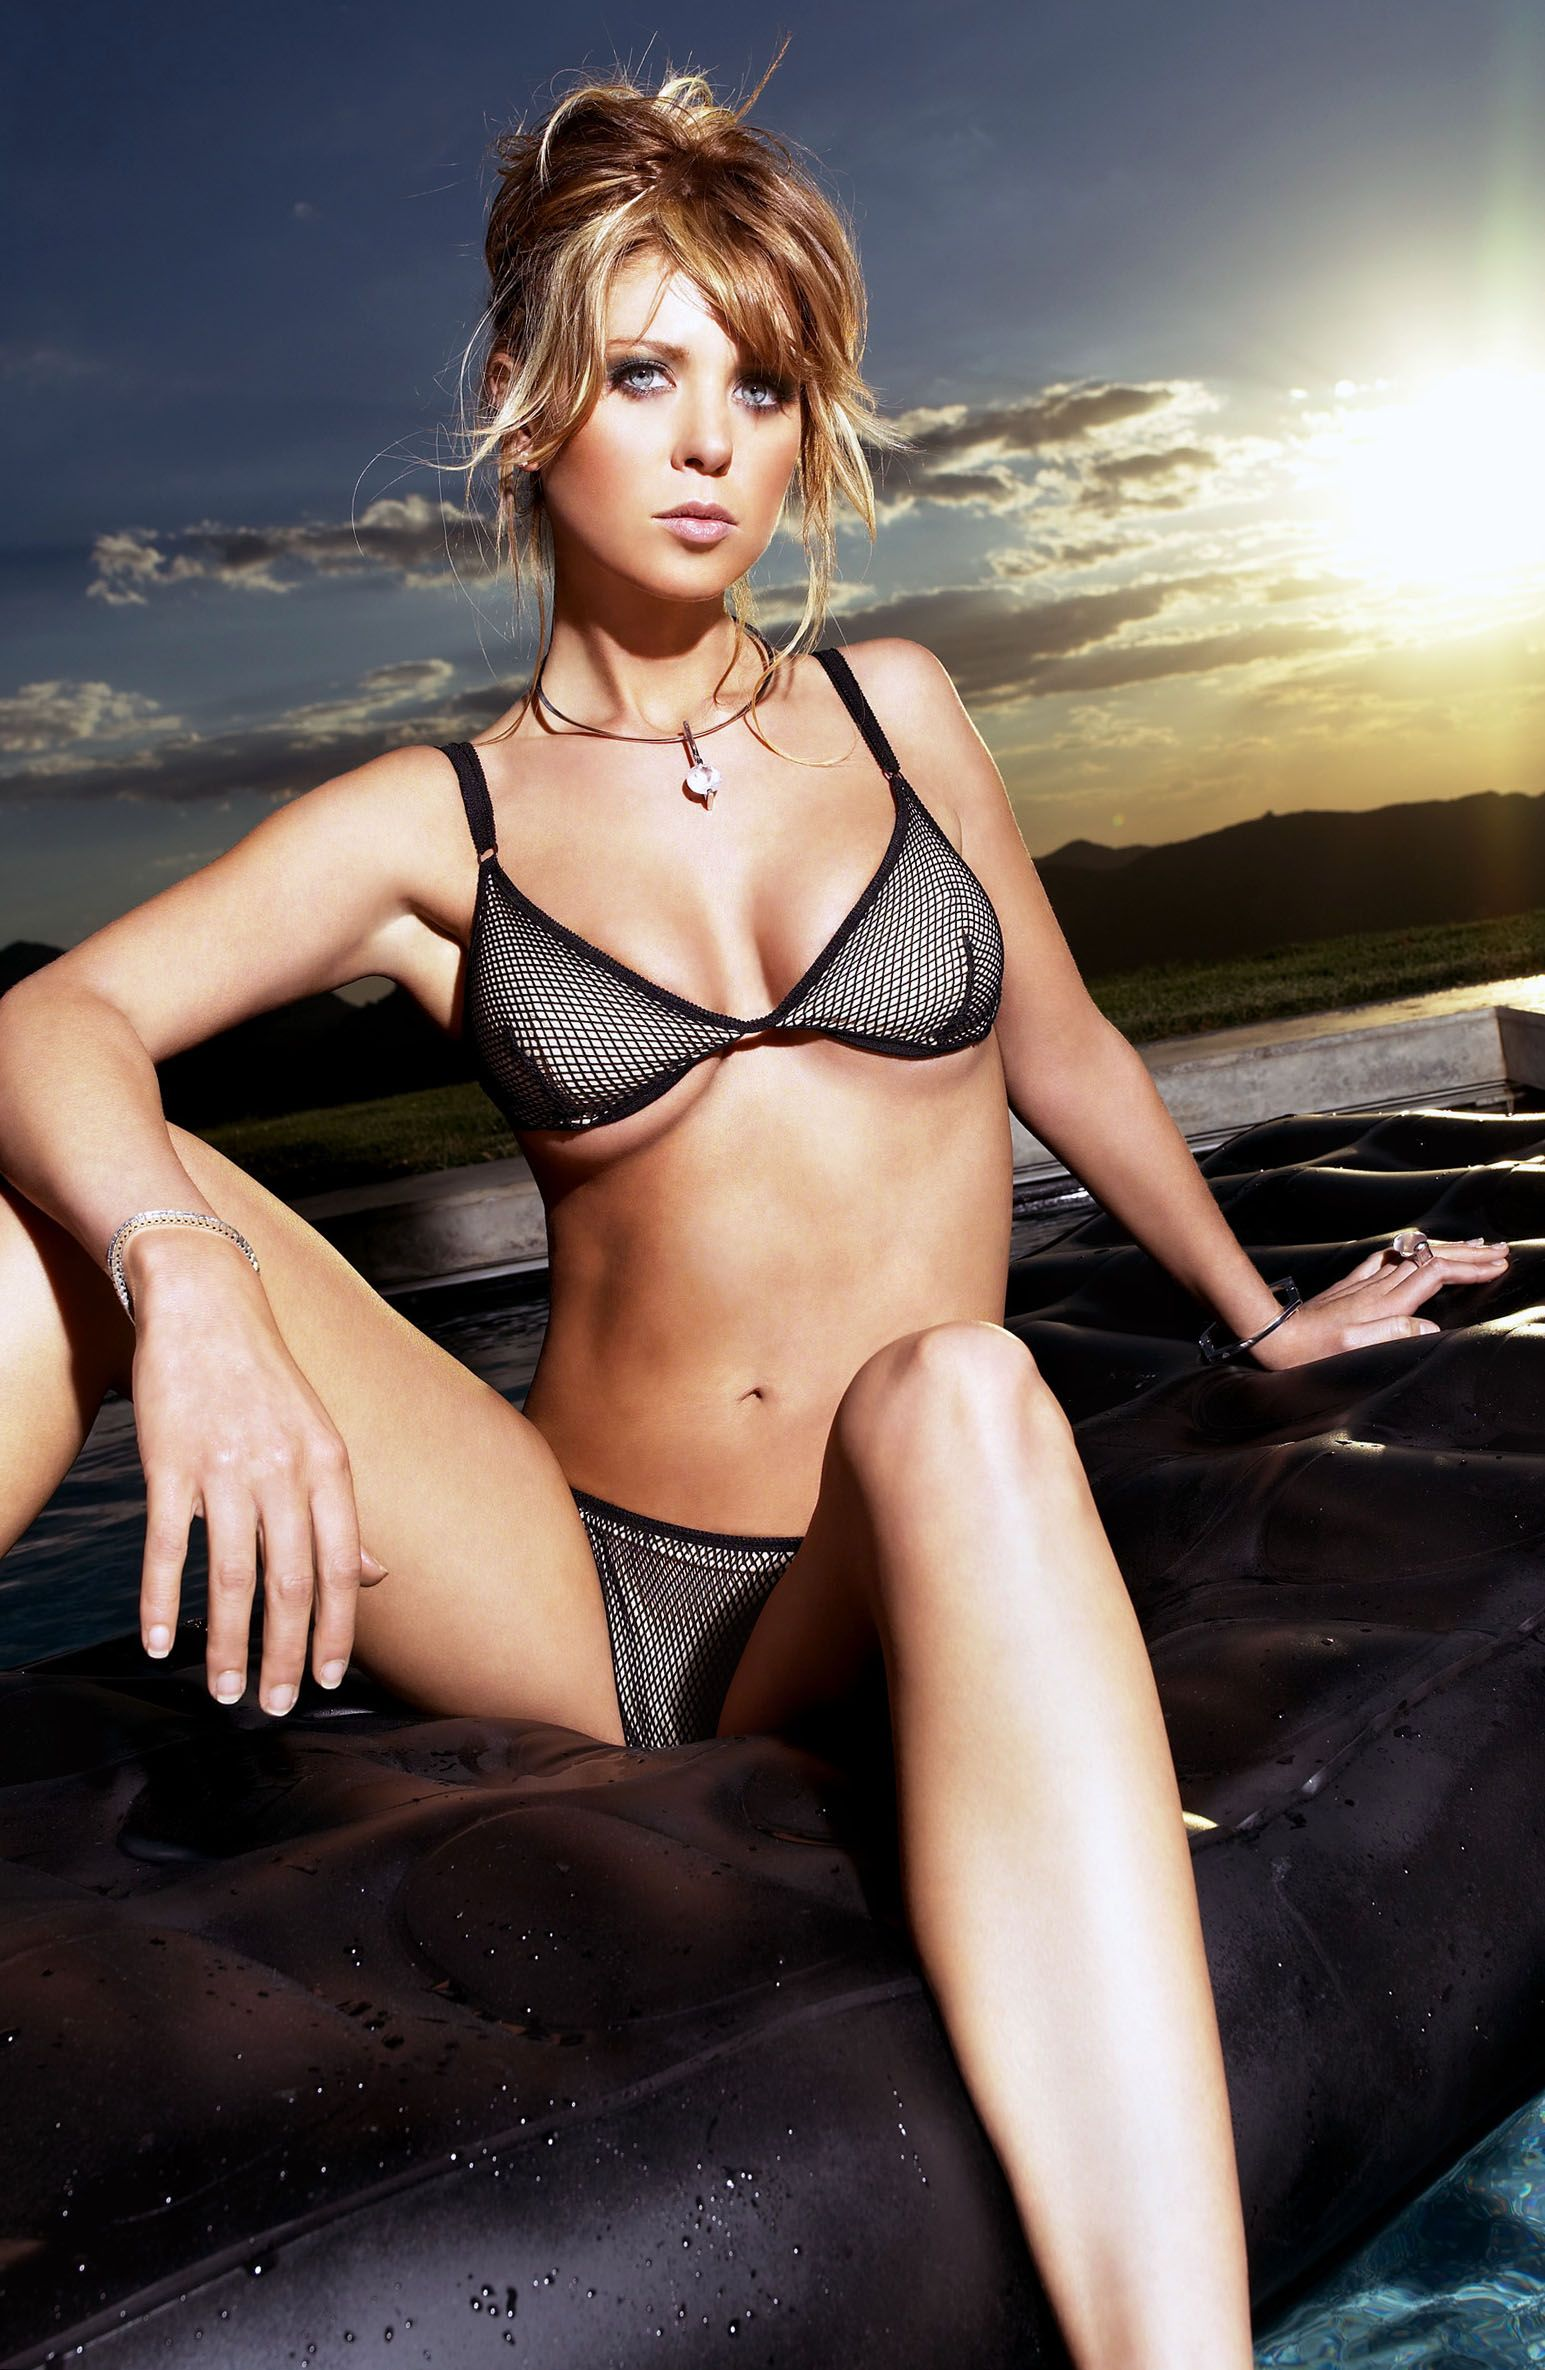 Rhona mitre sexy pictures